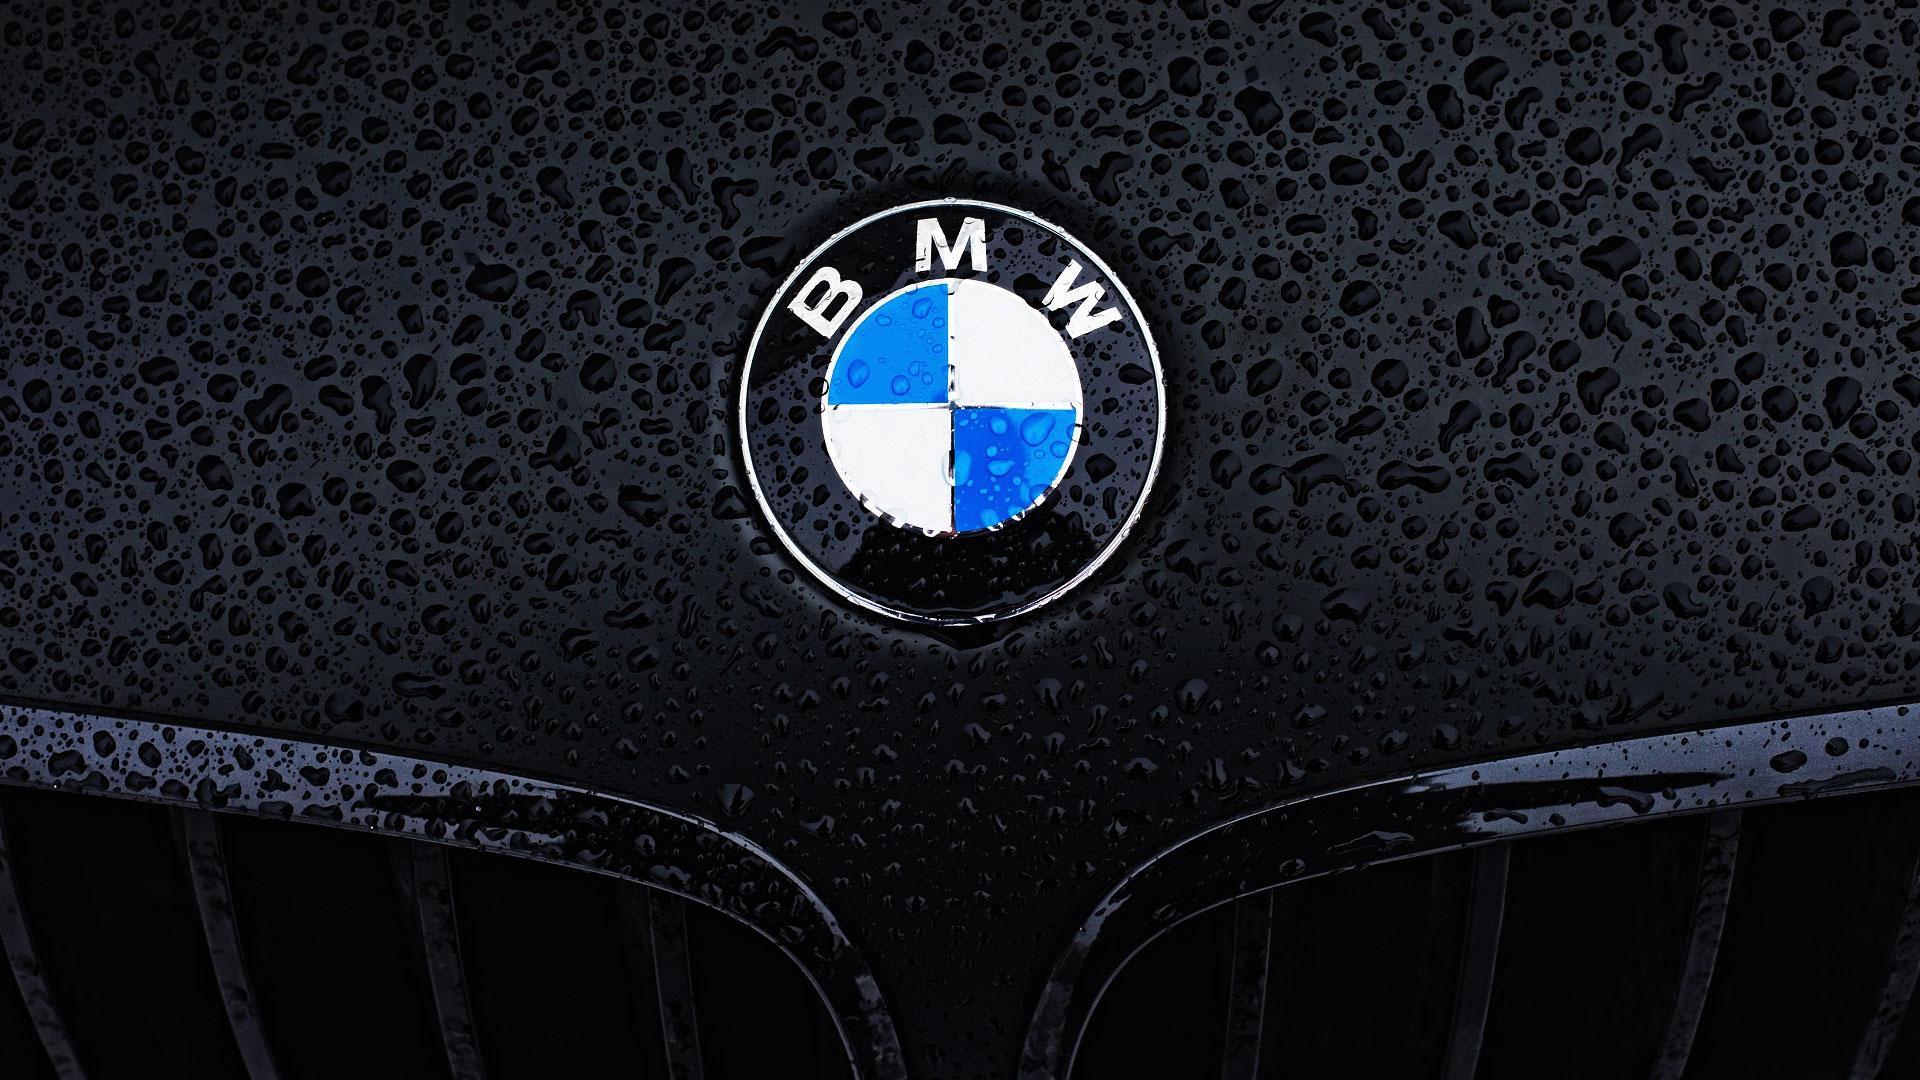 BMW Headlights Wallpapers - Wallpaper Cave